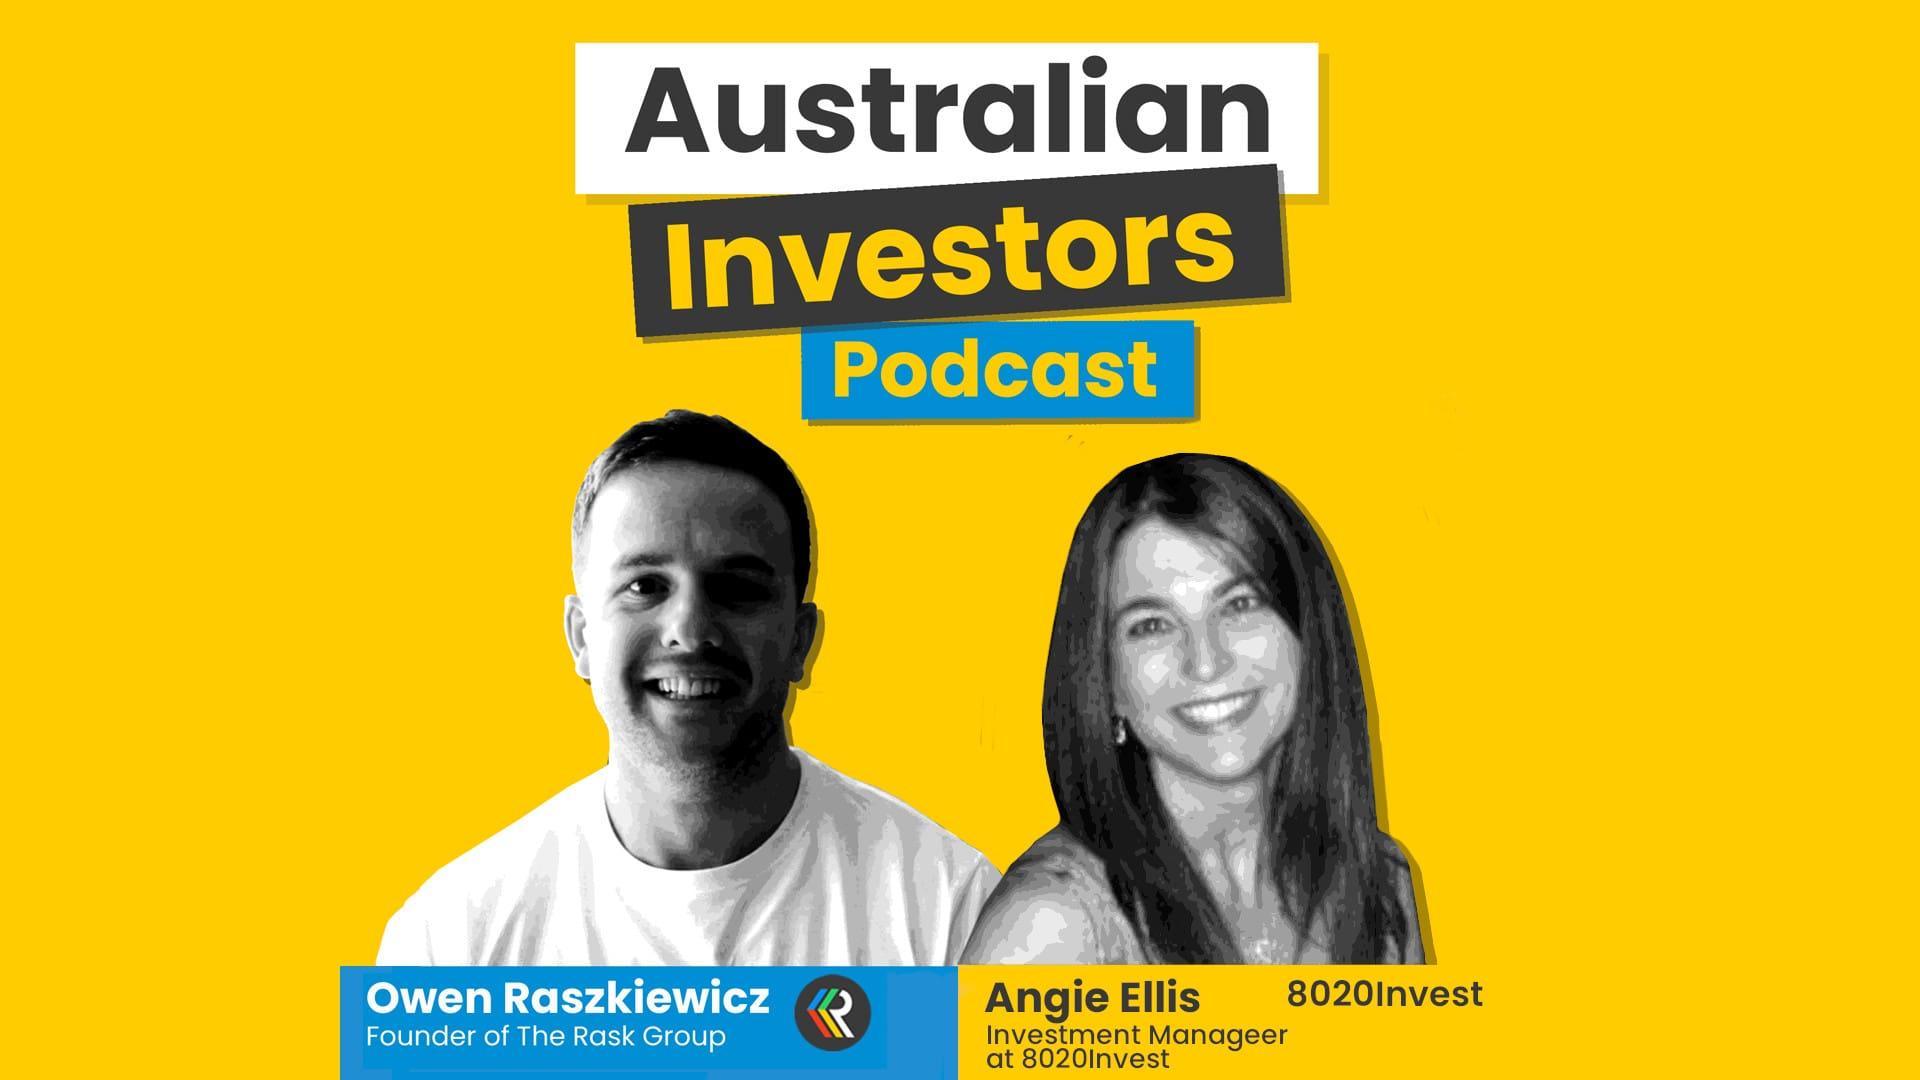 Angie-ellis-Australian-Investors-Podcast